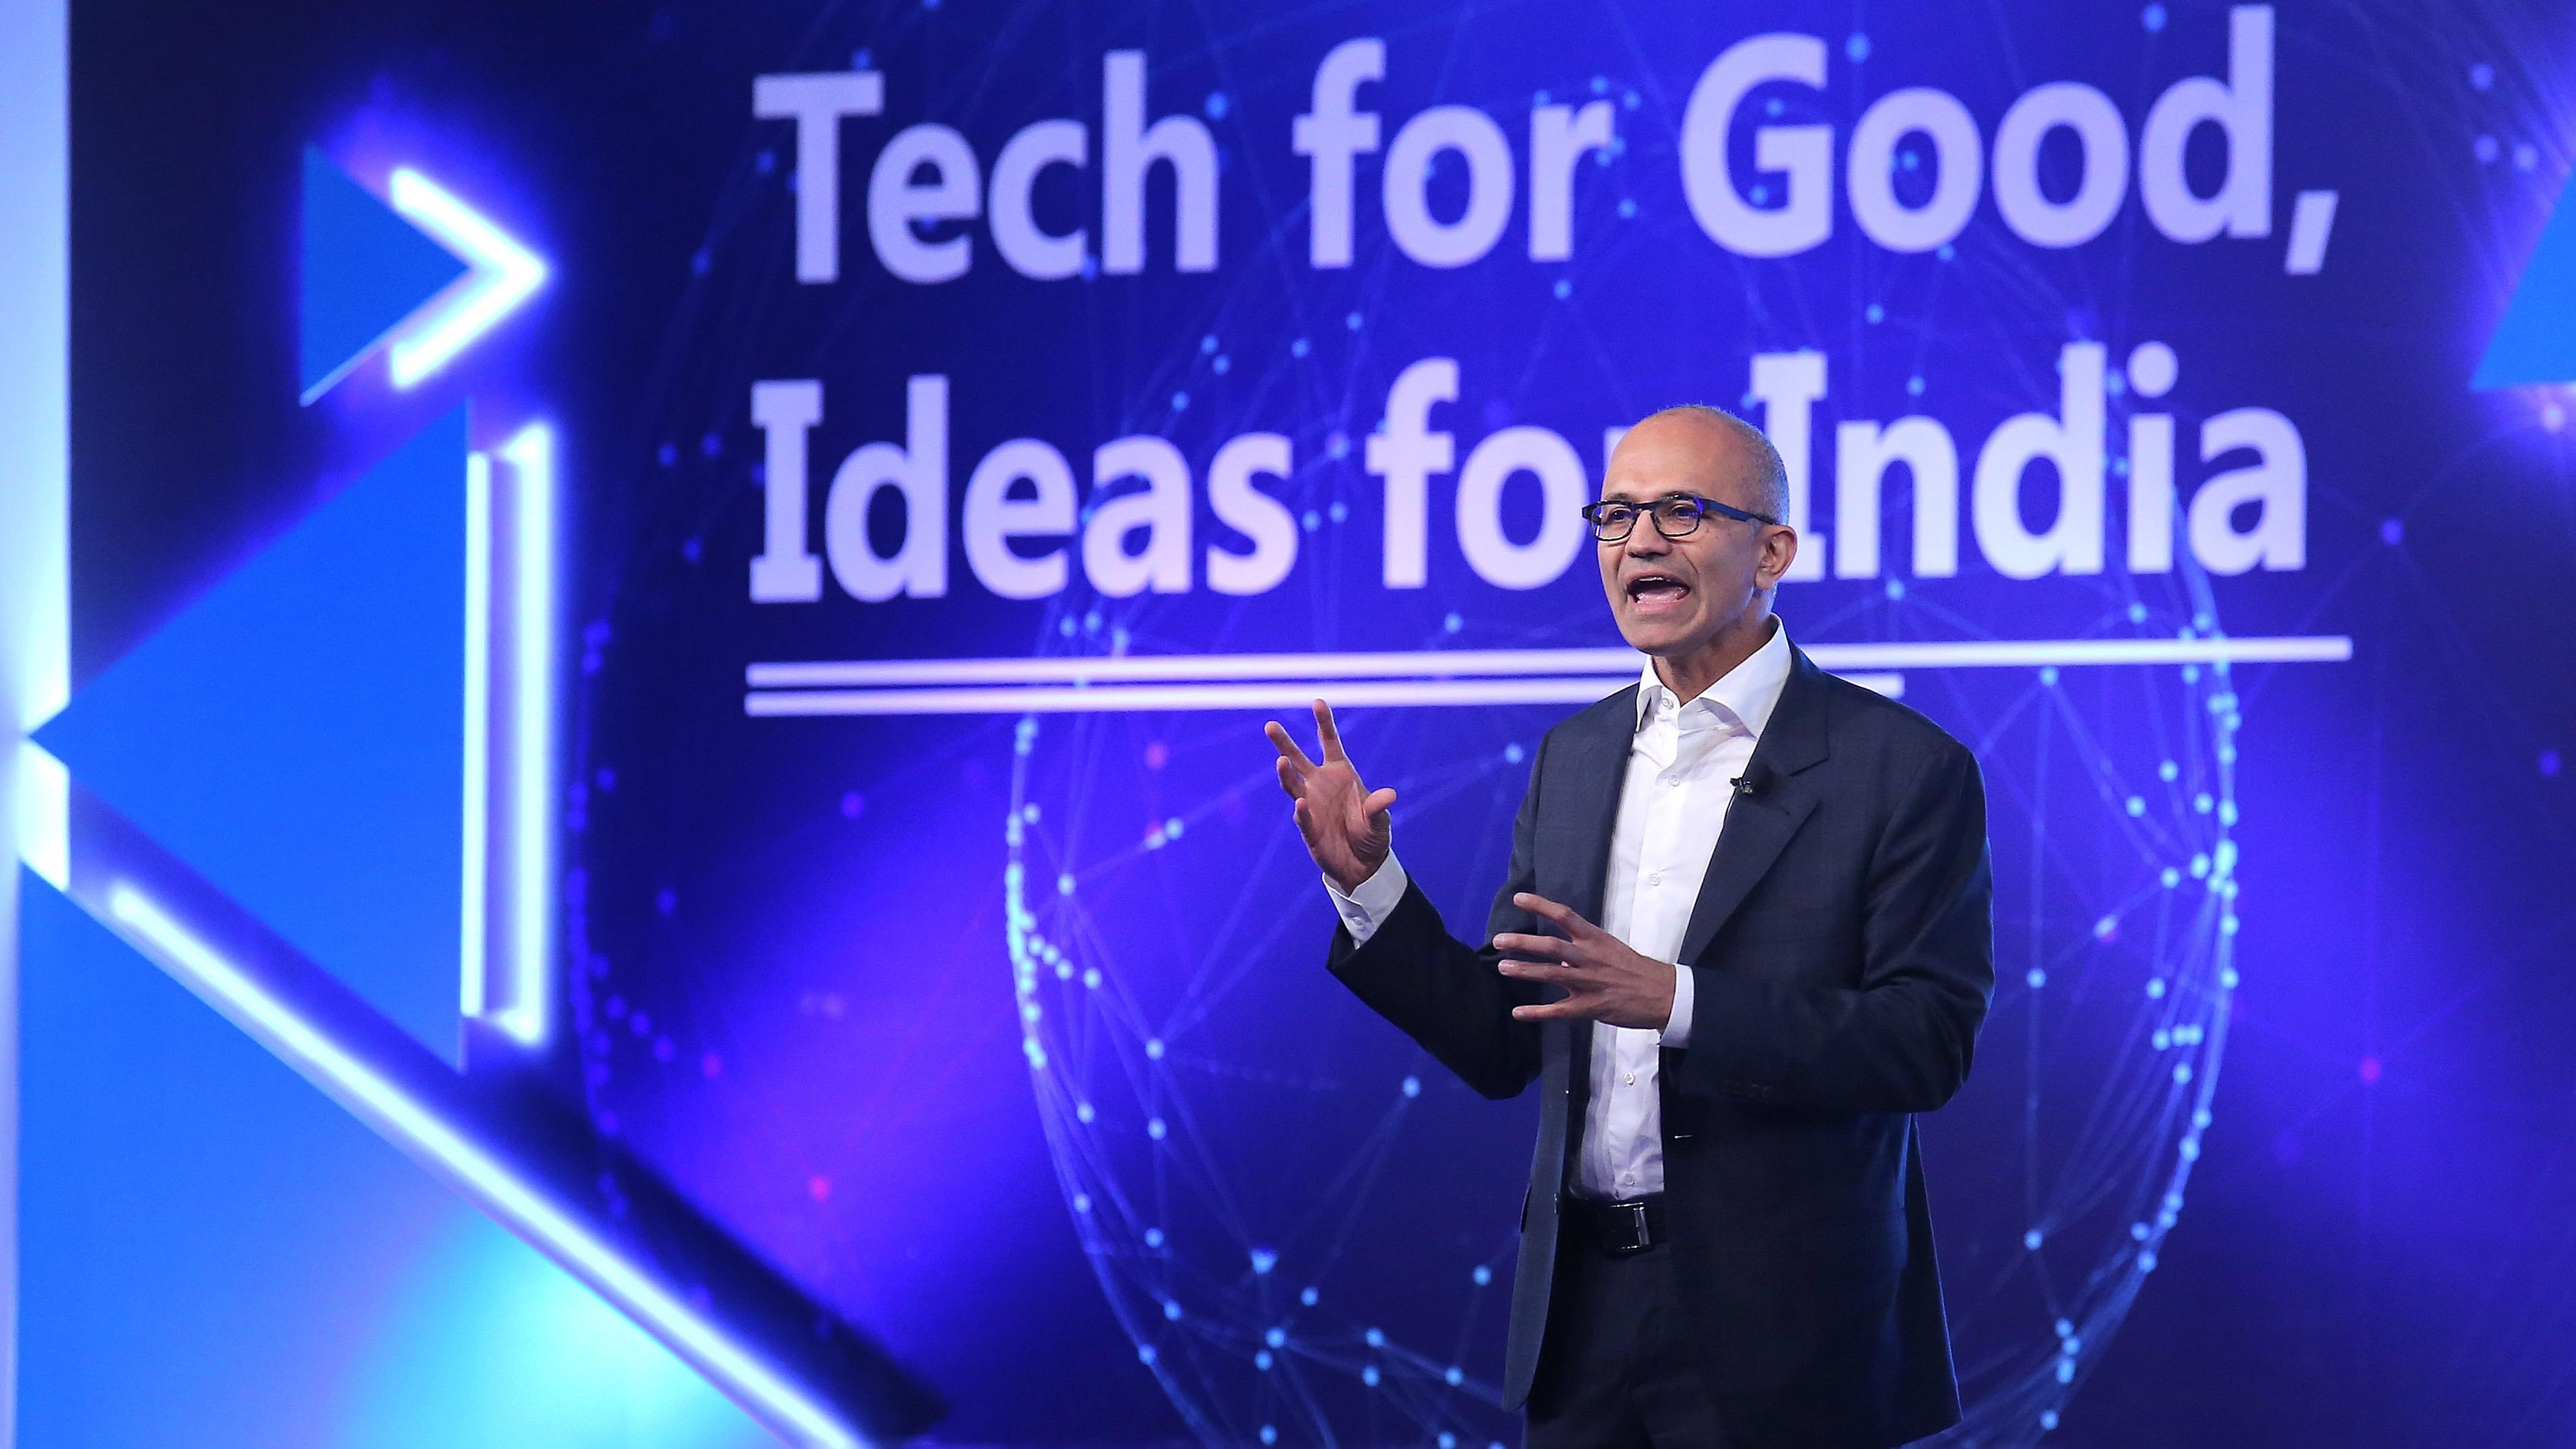 Chief Executive Officer of Microsoft Satya Nadella in India